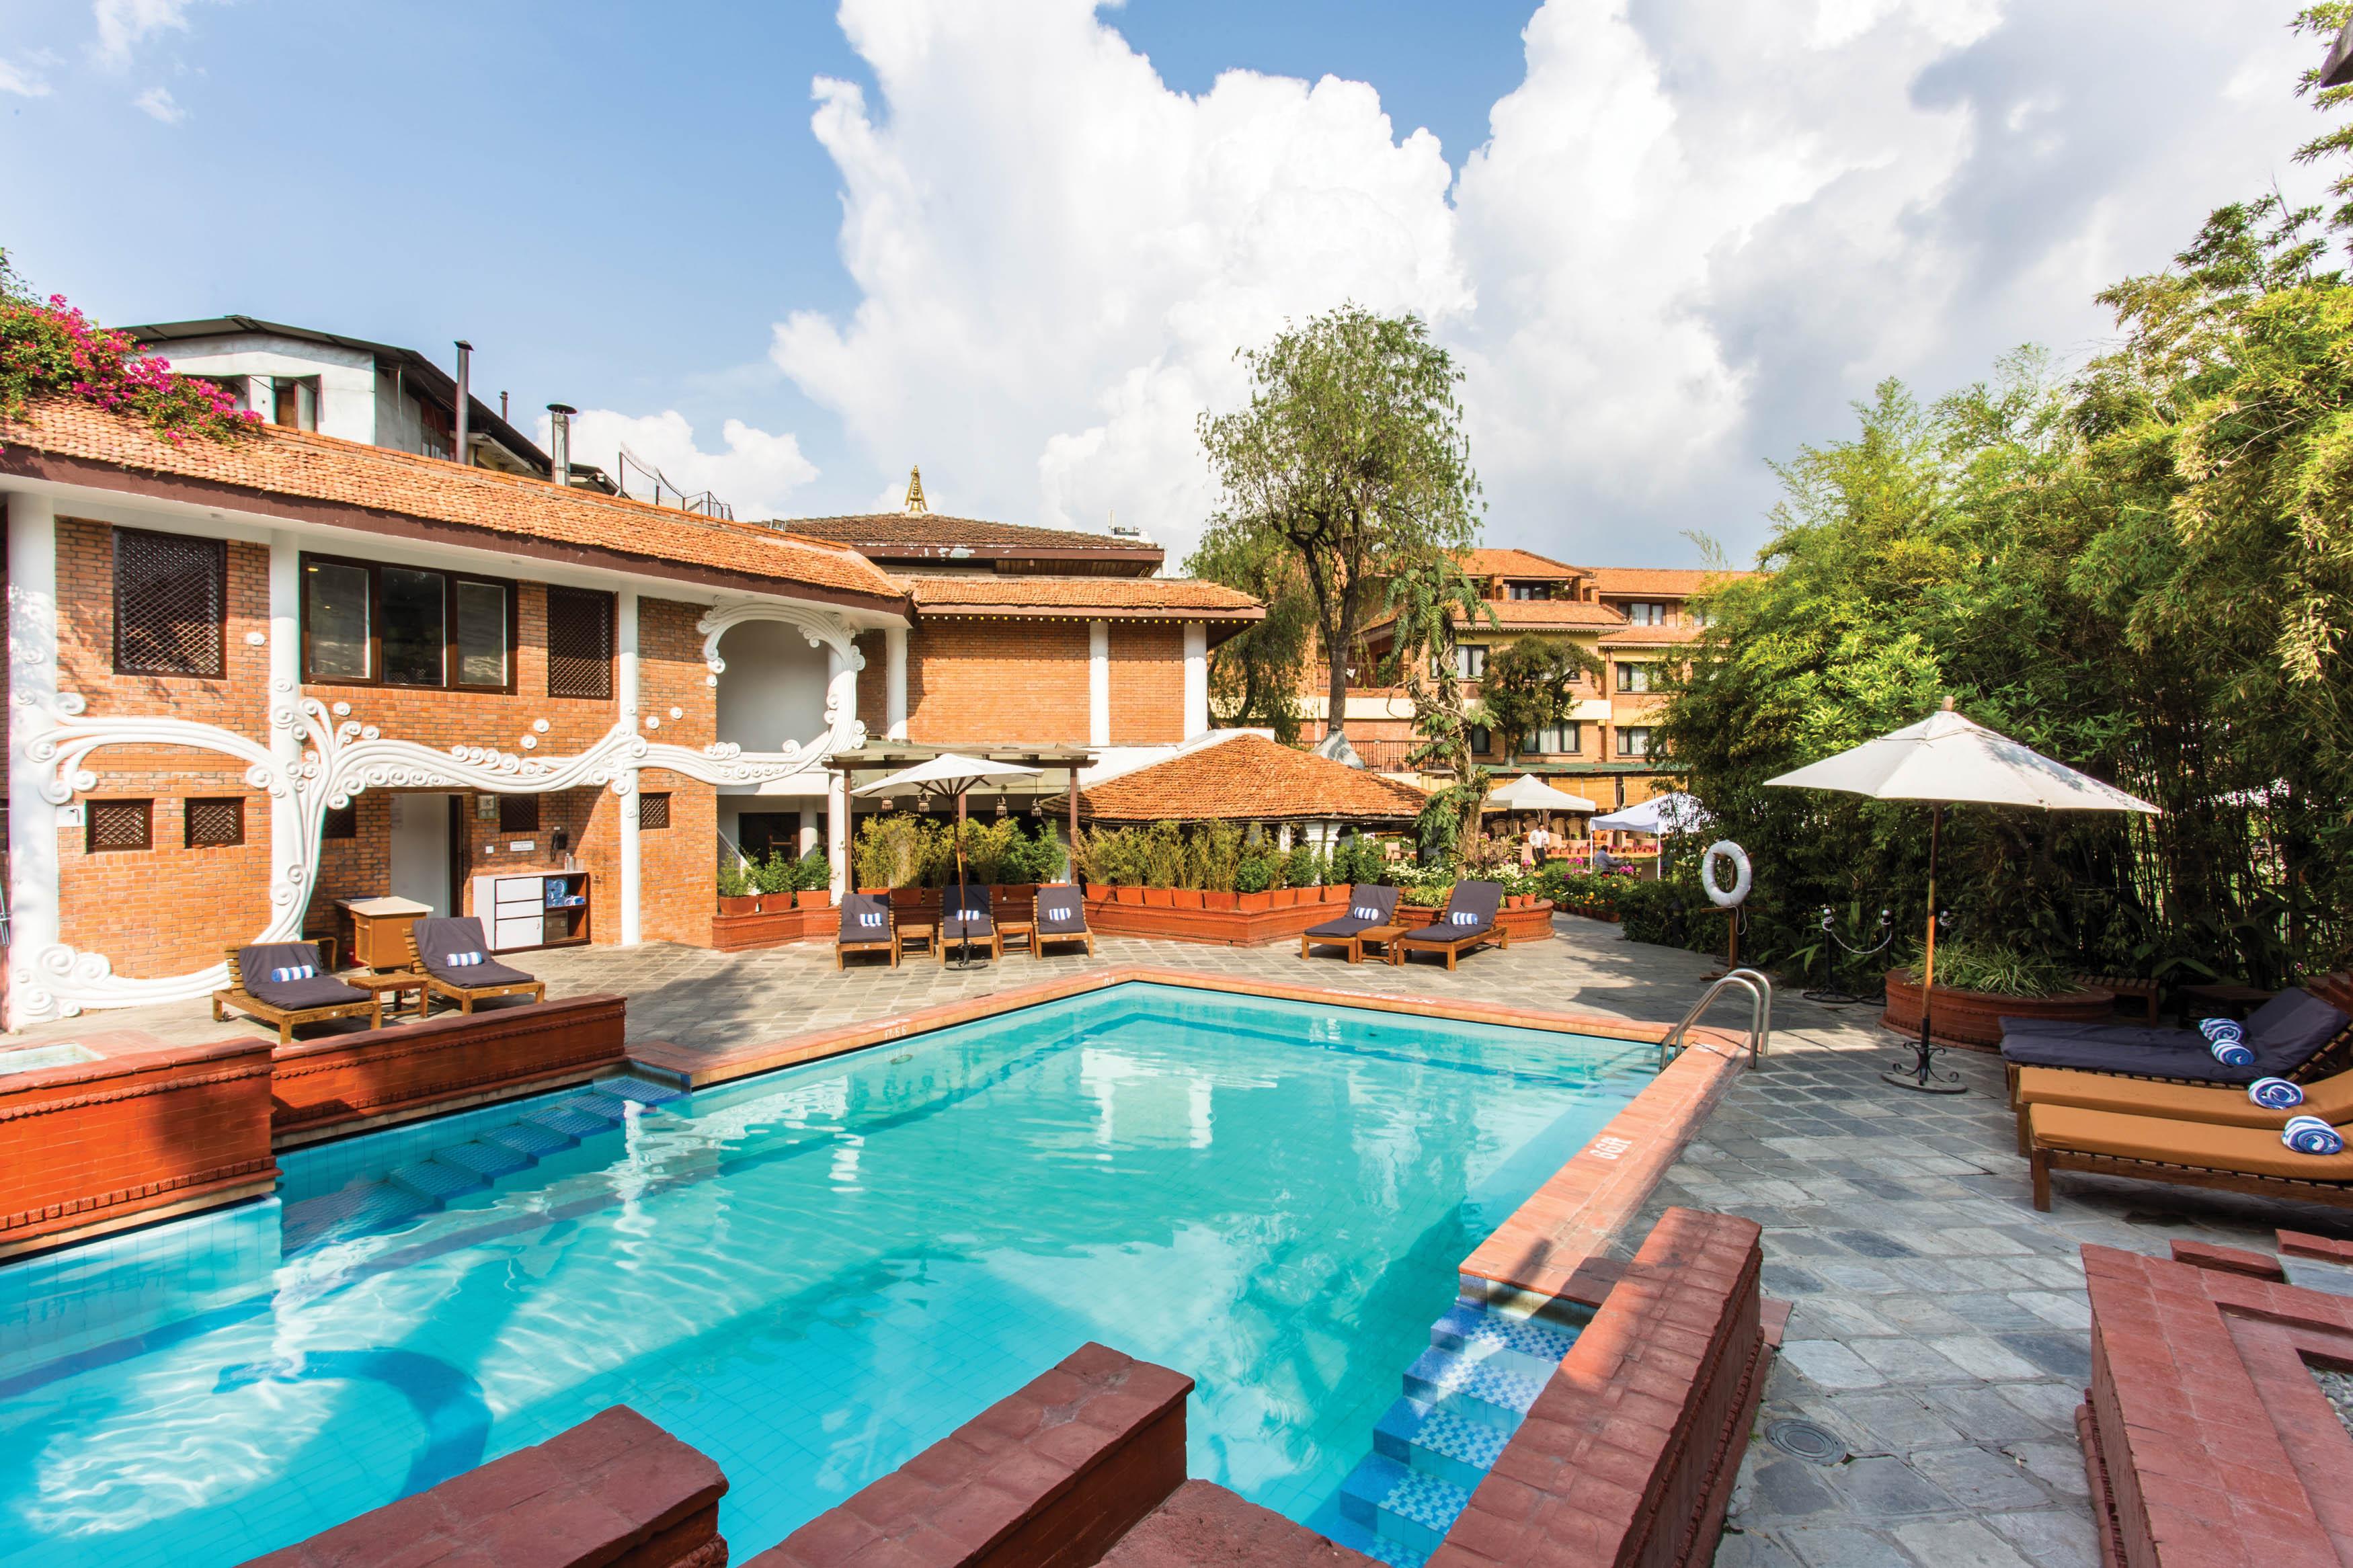 Shangri~La Hotel & Resort